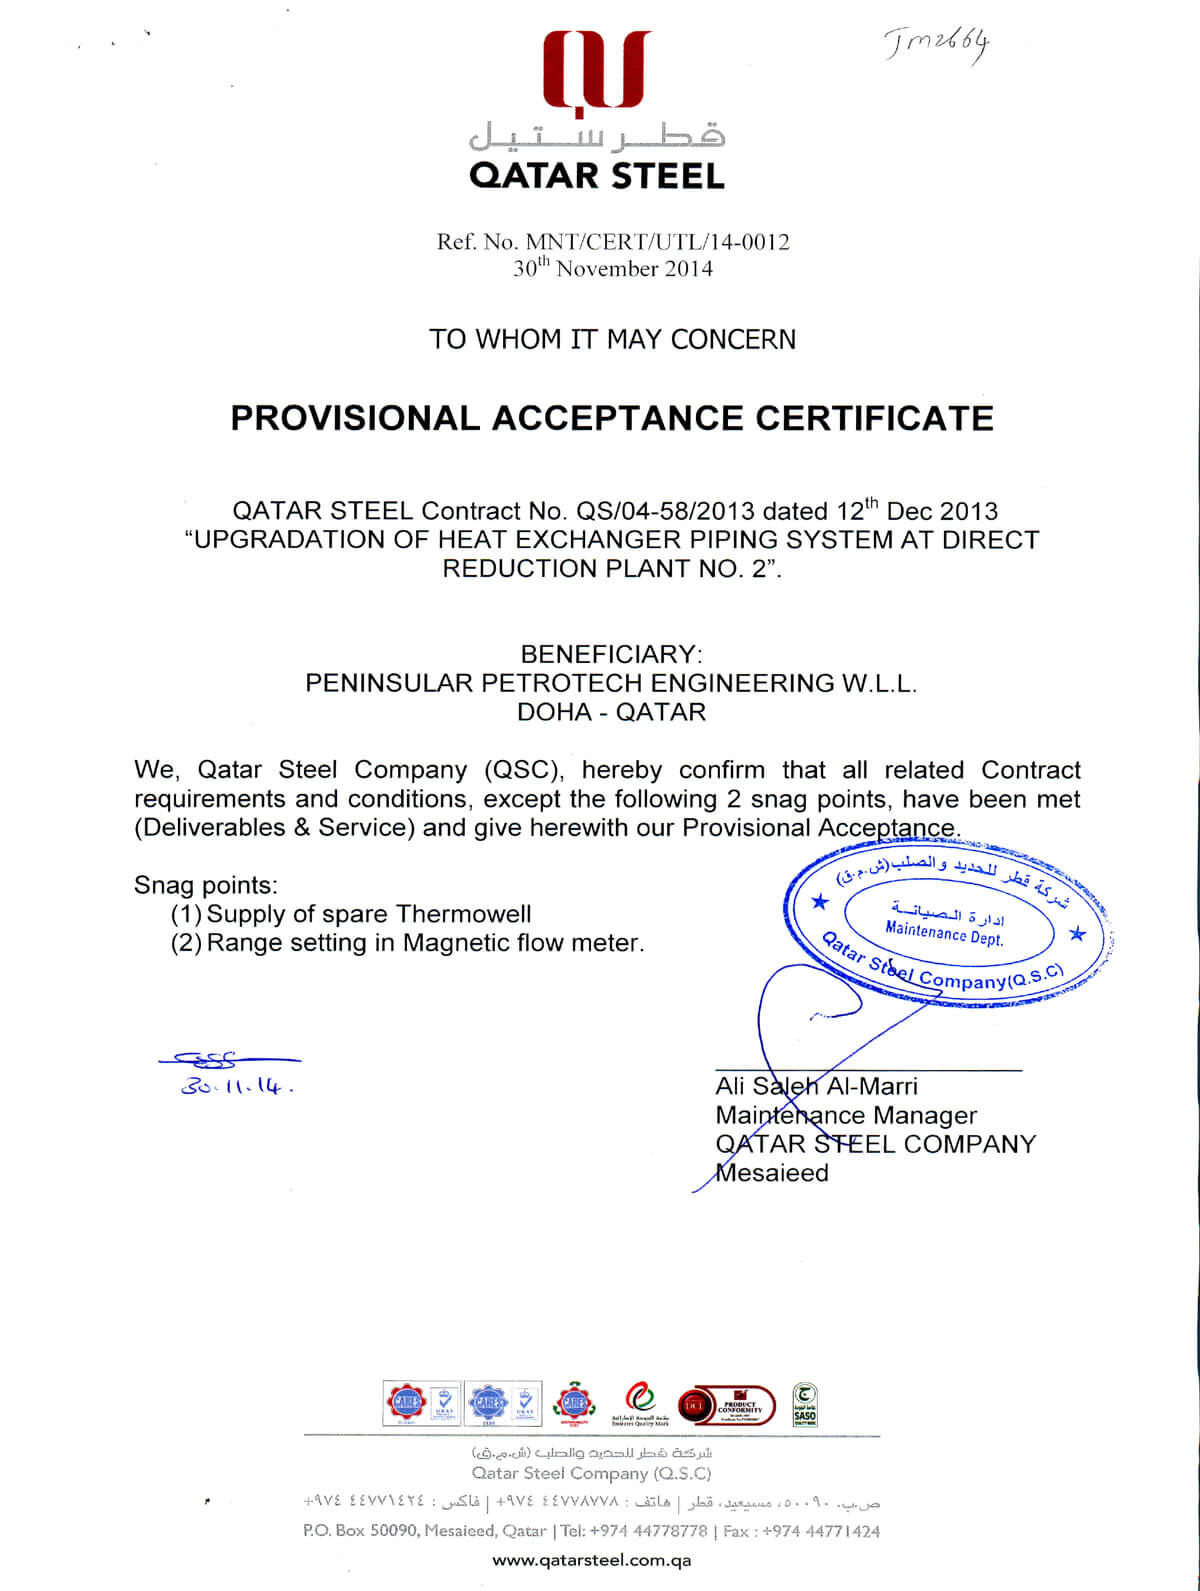 Acceptance Certificate Template ] - 10 Sample Printable Throughout Certificate Of Acceptance Template